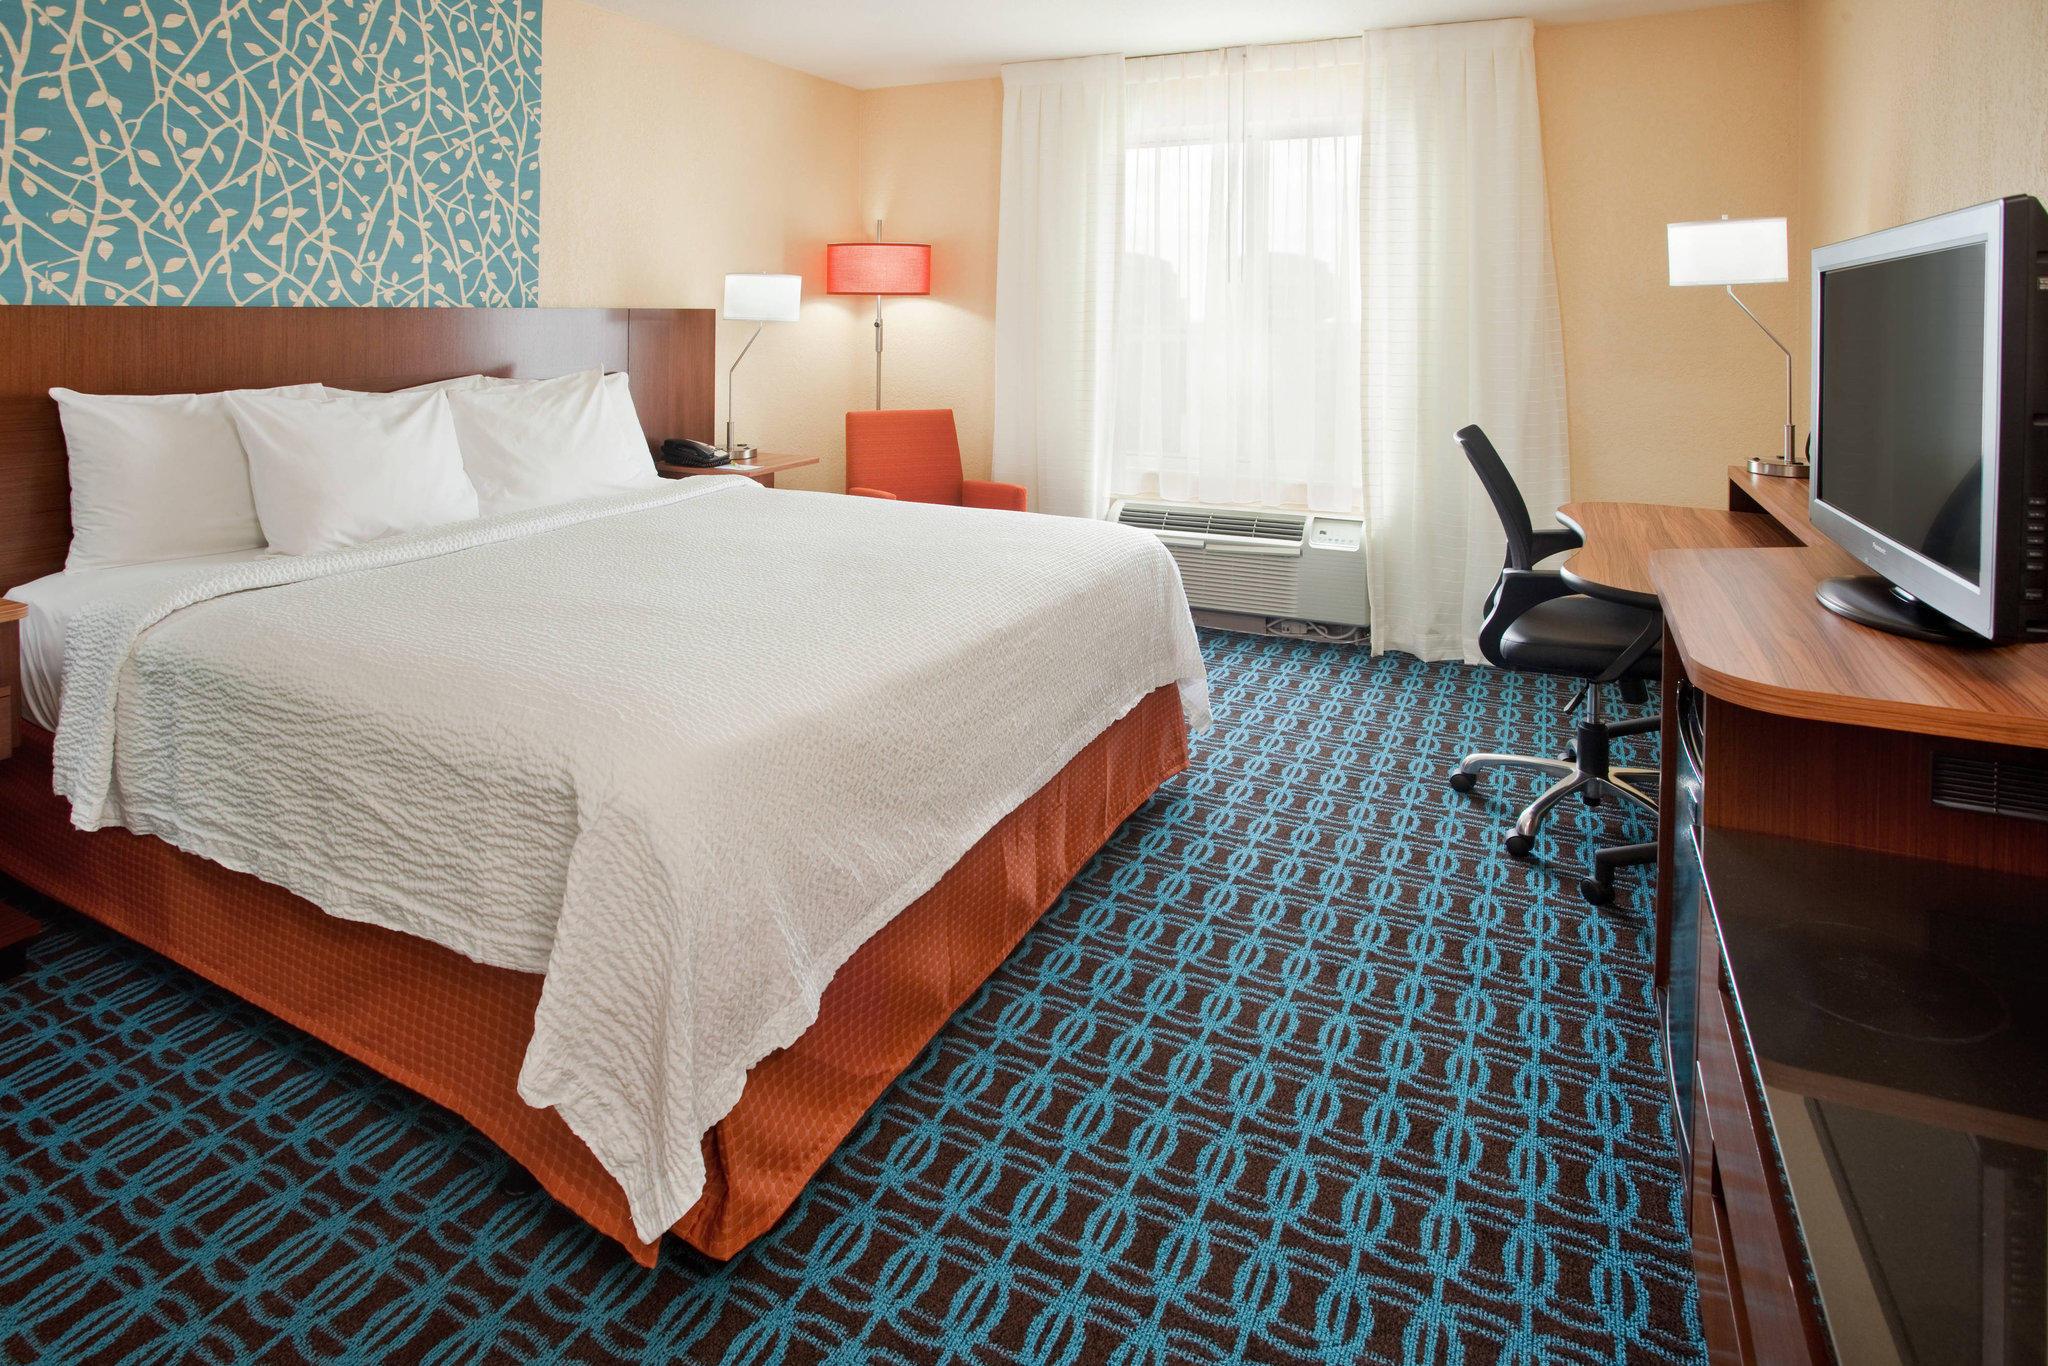 Fairfield Inn & Suites by Marriott San Antonio Downtown/Market Square